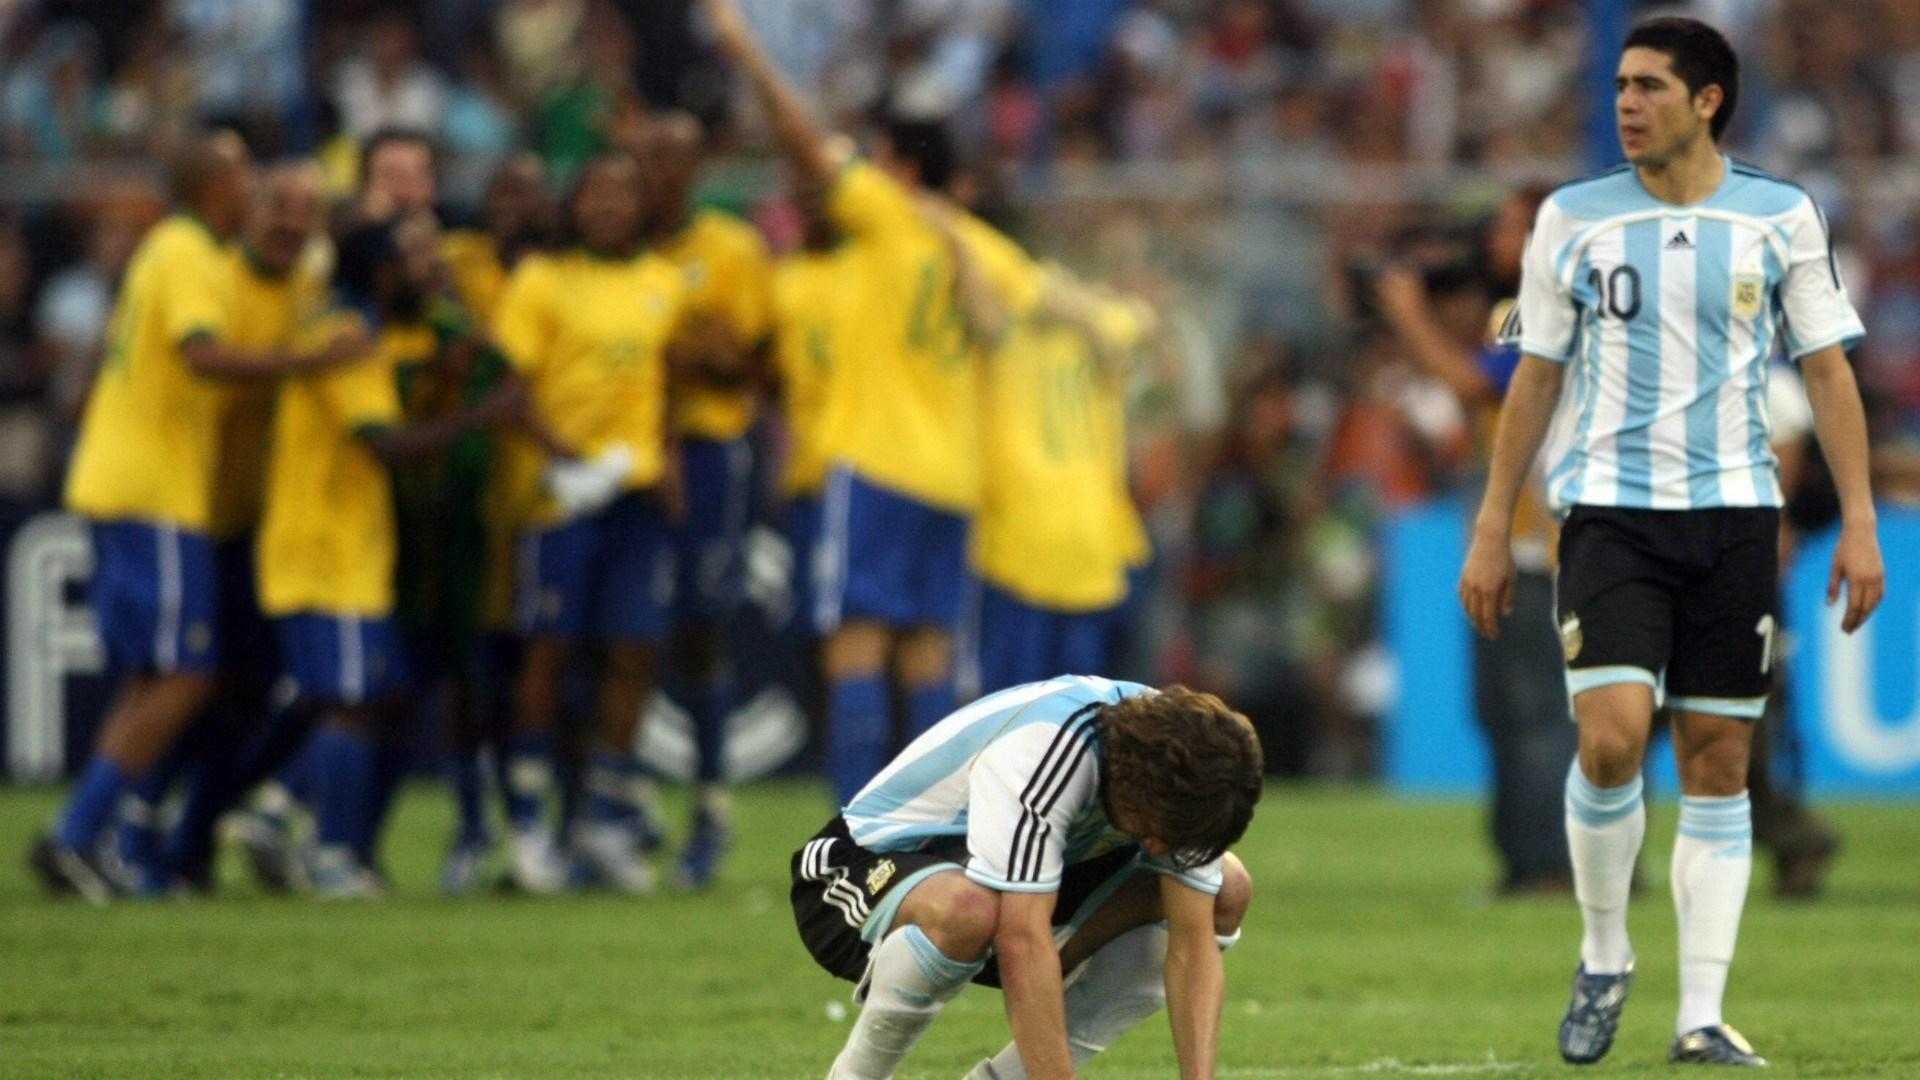 Brazil Vs. Argentina in the Copa America 2007 final (3-0)